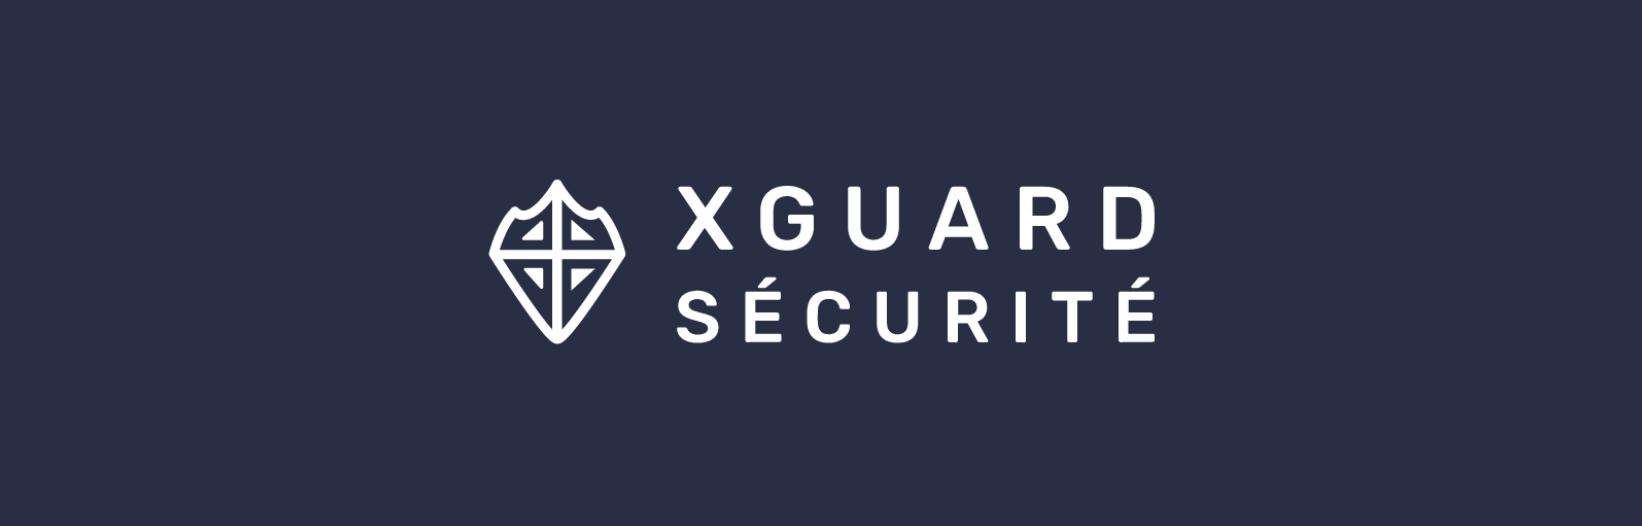 XGuard logo